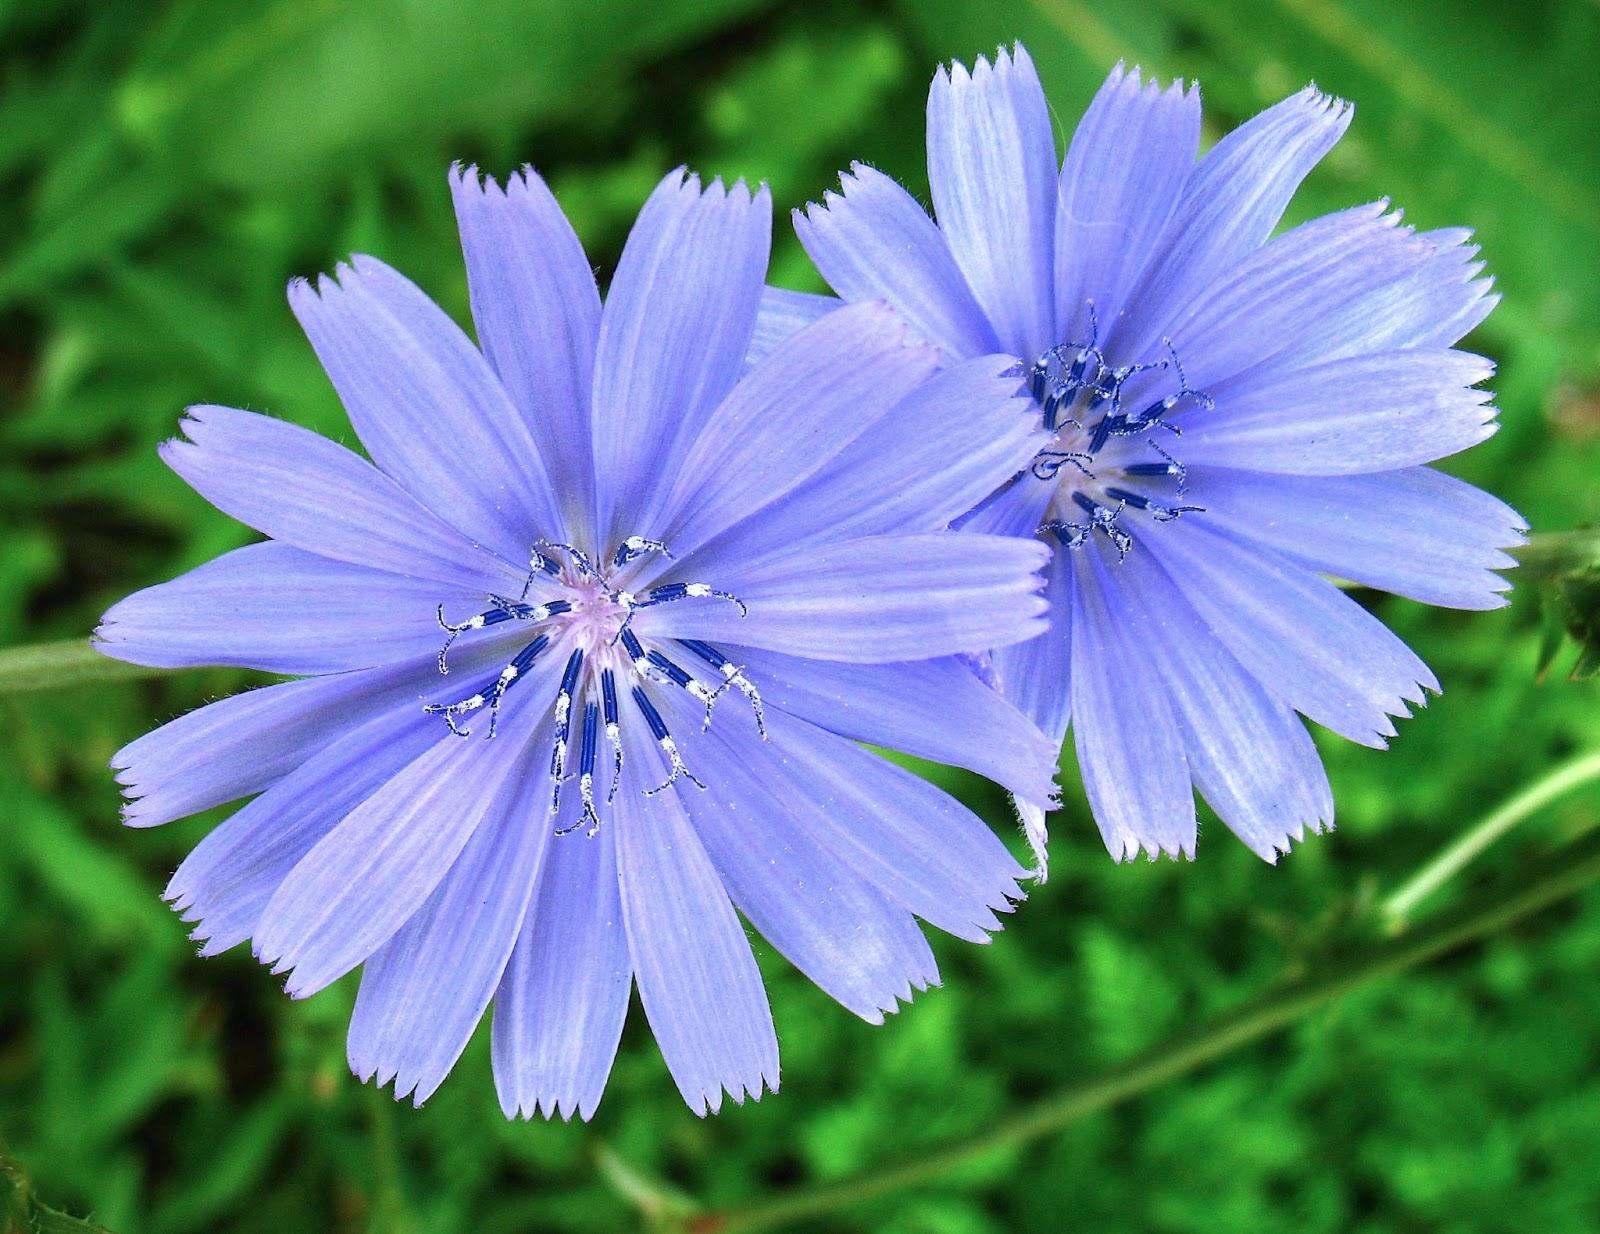 chicory wallpaper flower - photo #24